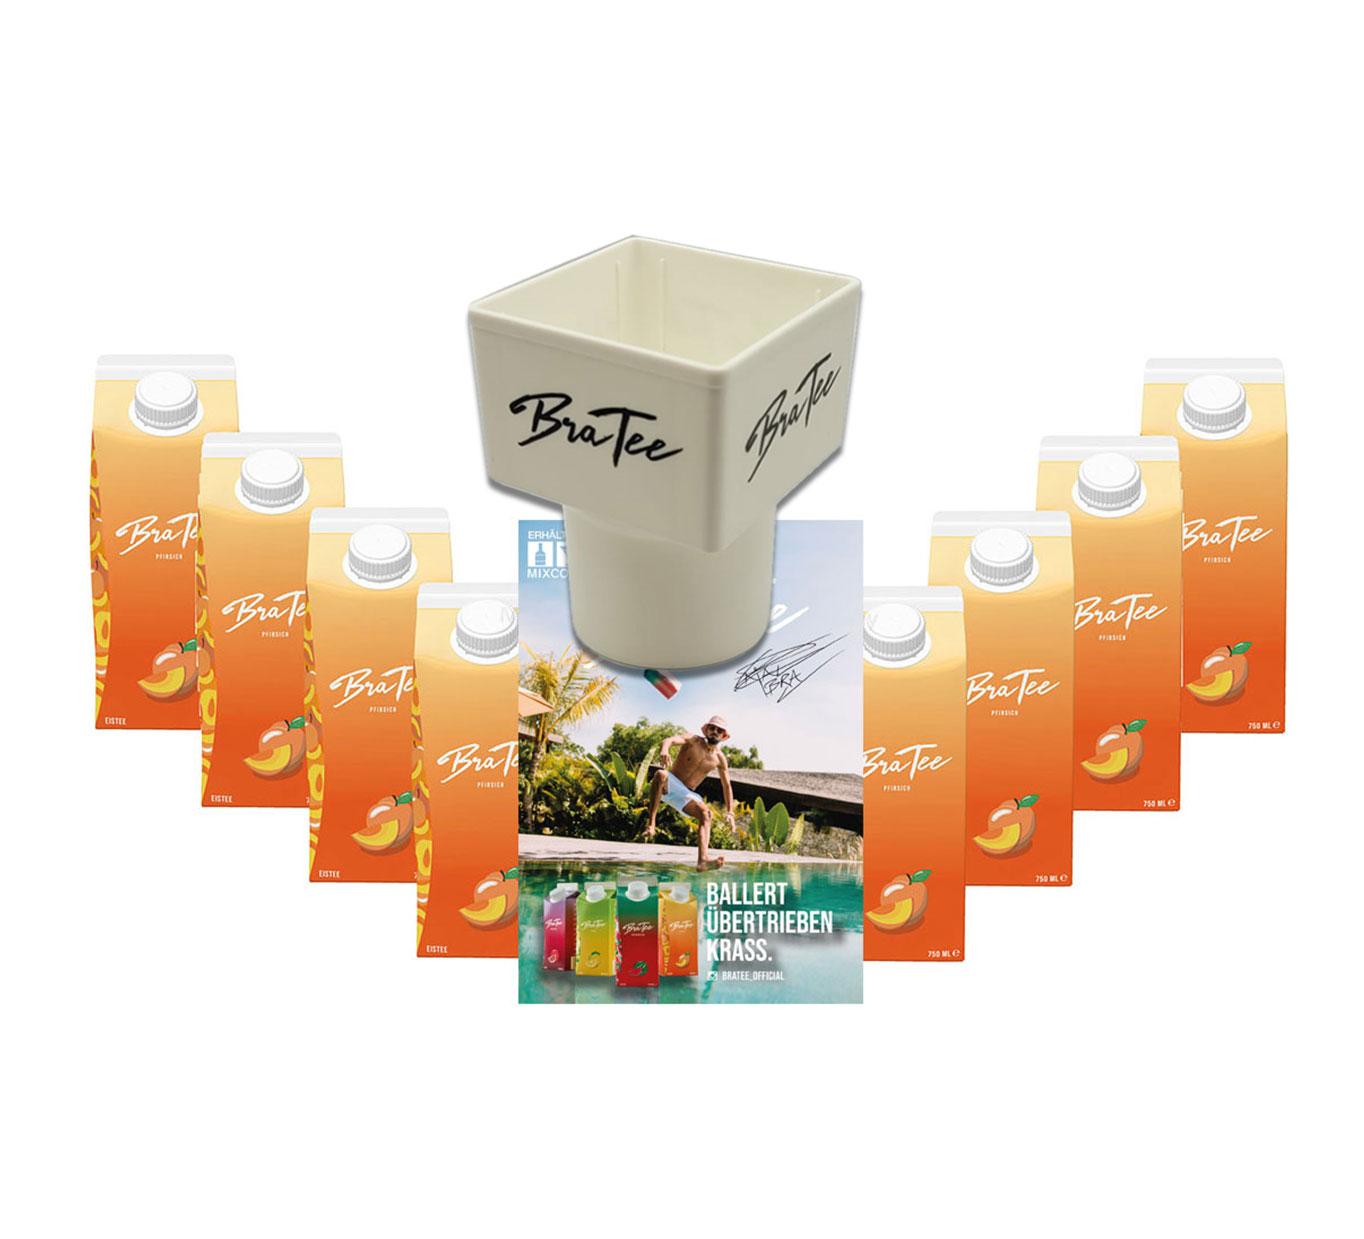 Capital BraTee 8er Set Eistee Pfirsich Peach 750ml + Gratis Getränkehalter + Autogrammkarte BRATEE Ice tea - Der Klassiker unter den Eistees: Pfirsichgeschmack. Dazu noch mit Capi-Qualitäts-Siegel - Du weisst Bescheid